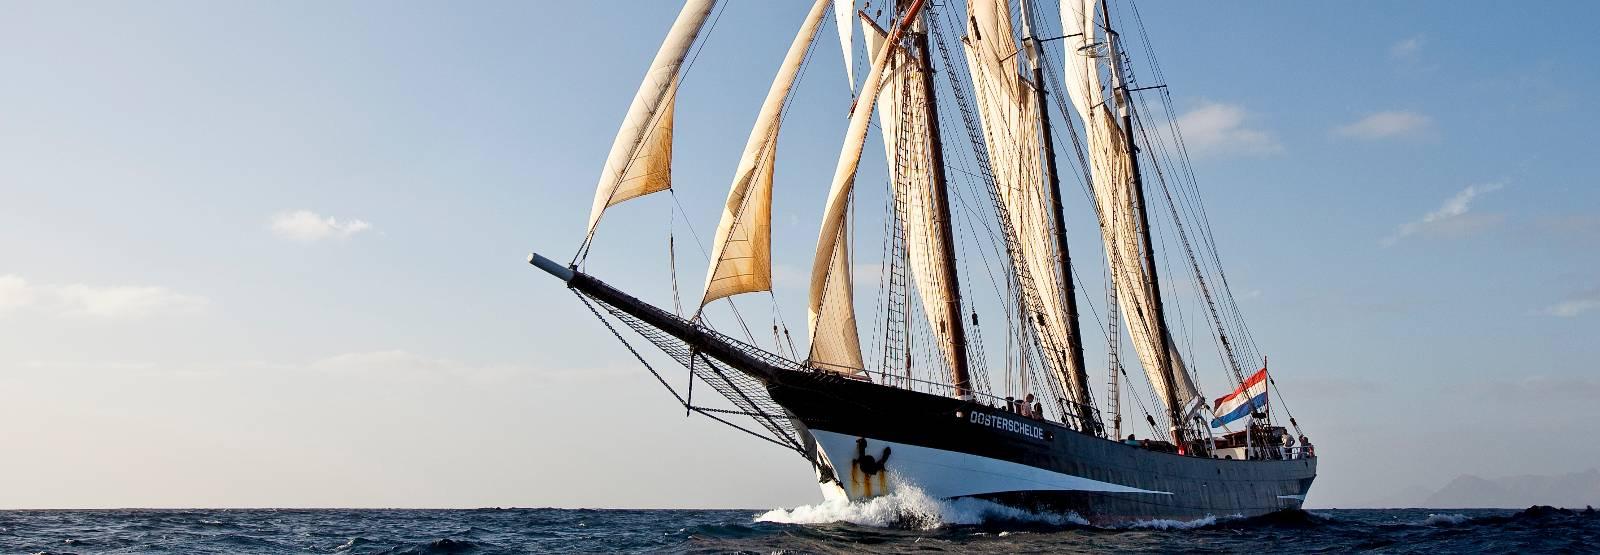 Cape Verde Sailing Adventure – Another World Adventures